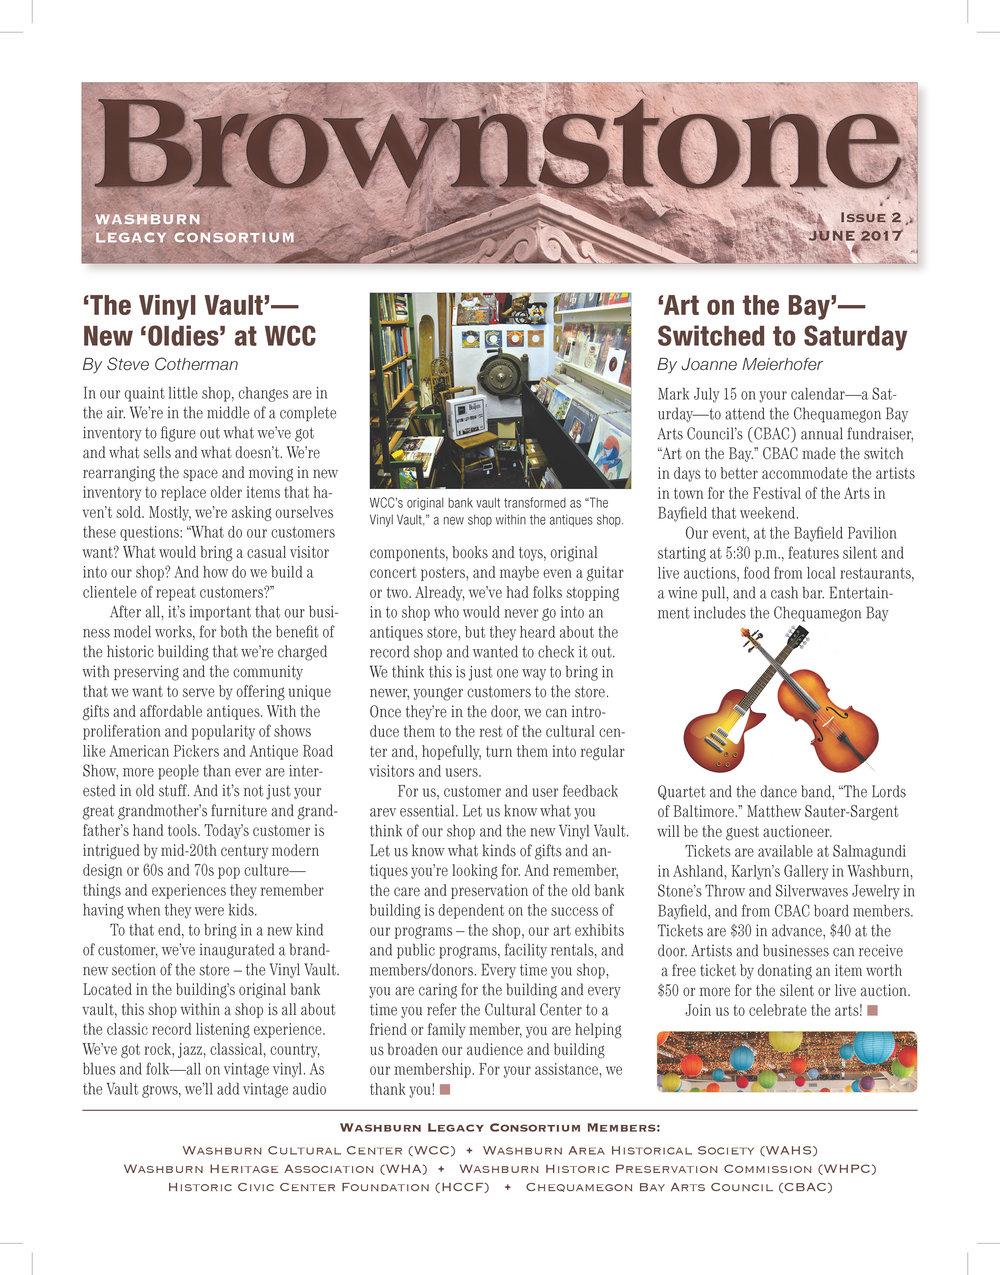 Brownstone_Summer2017_6.20.17_FINAL_crops_Page_1.jpg